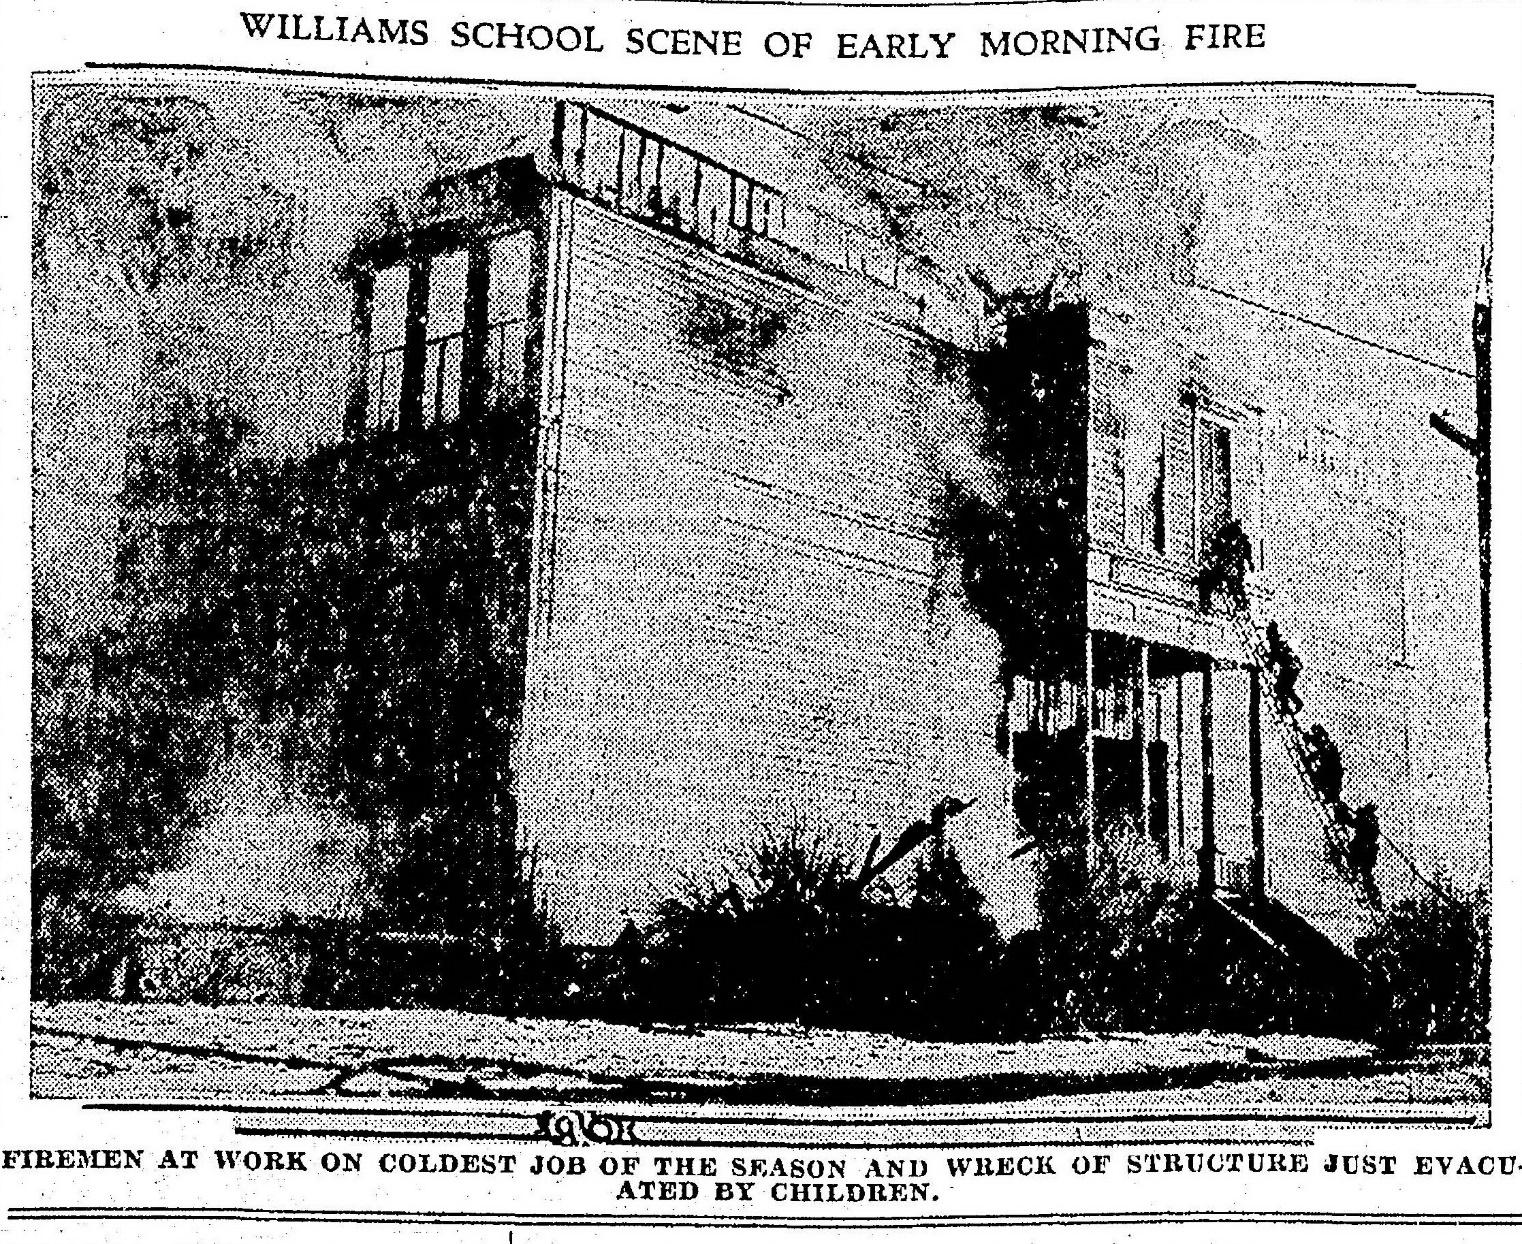 Willams- Central school fire Jan 13 1930 (2)